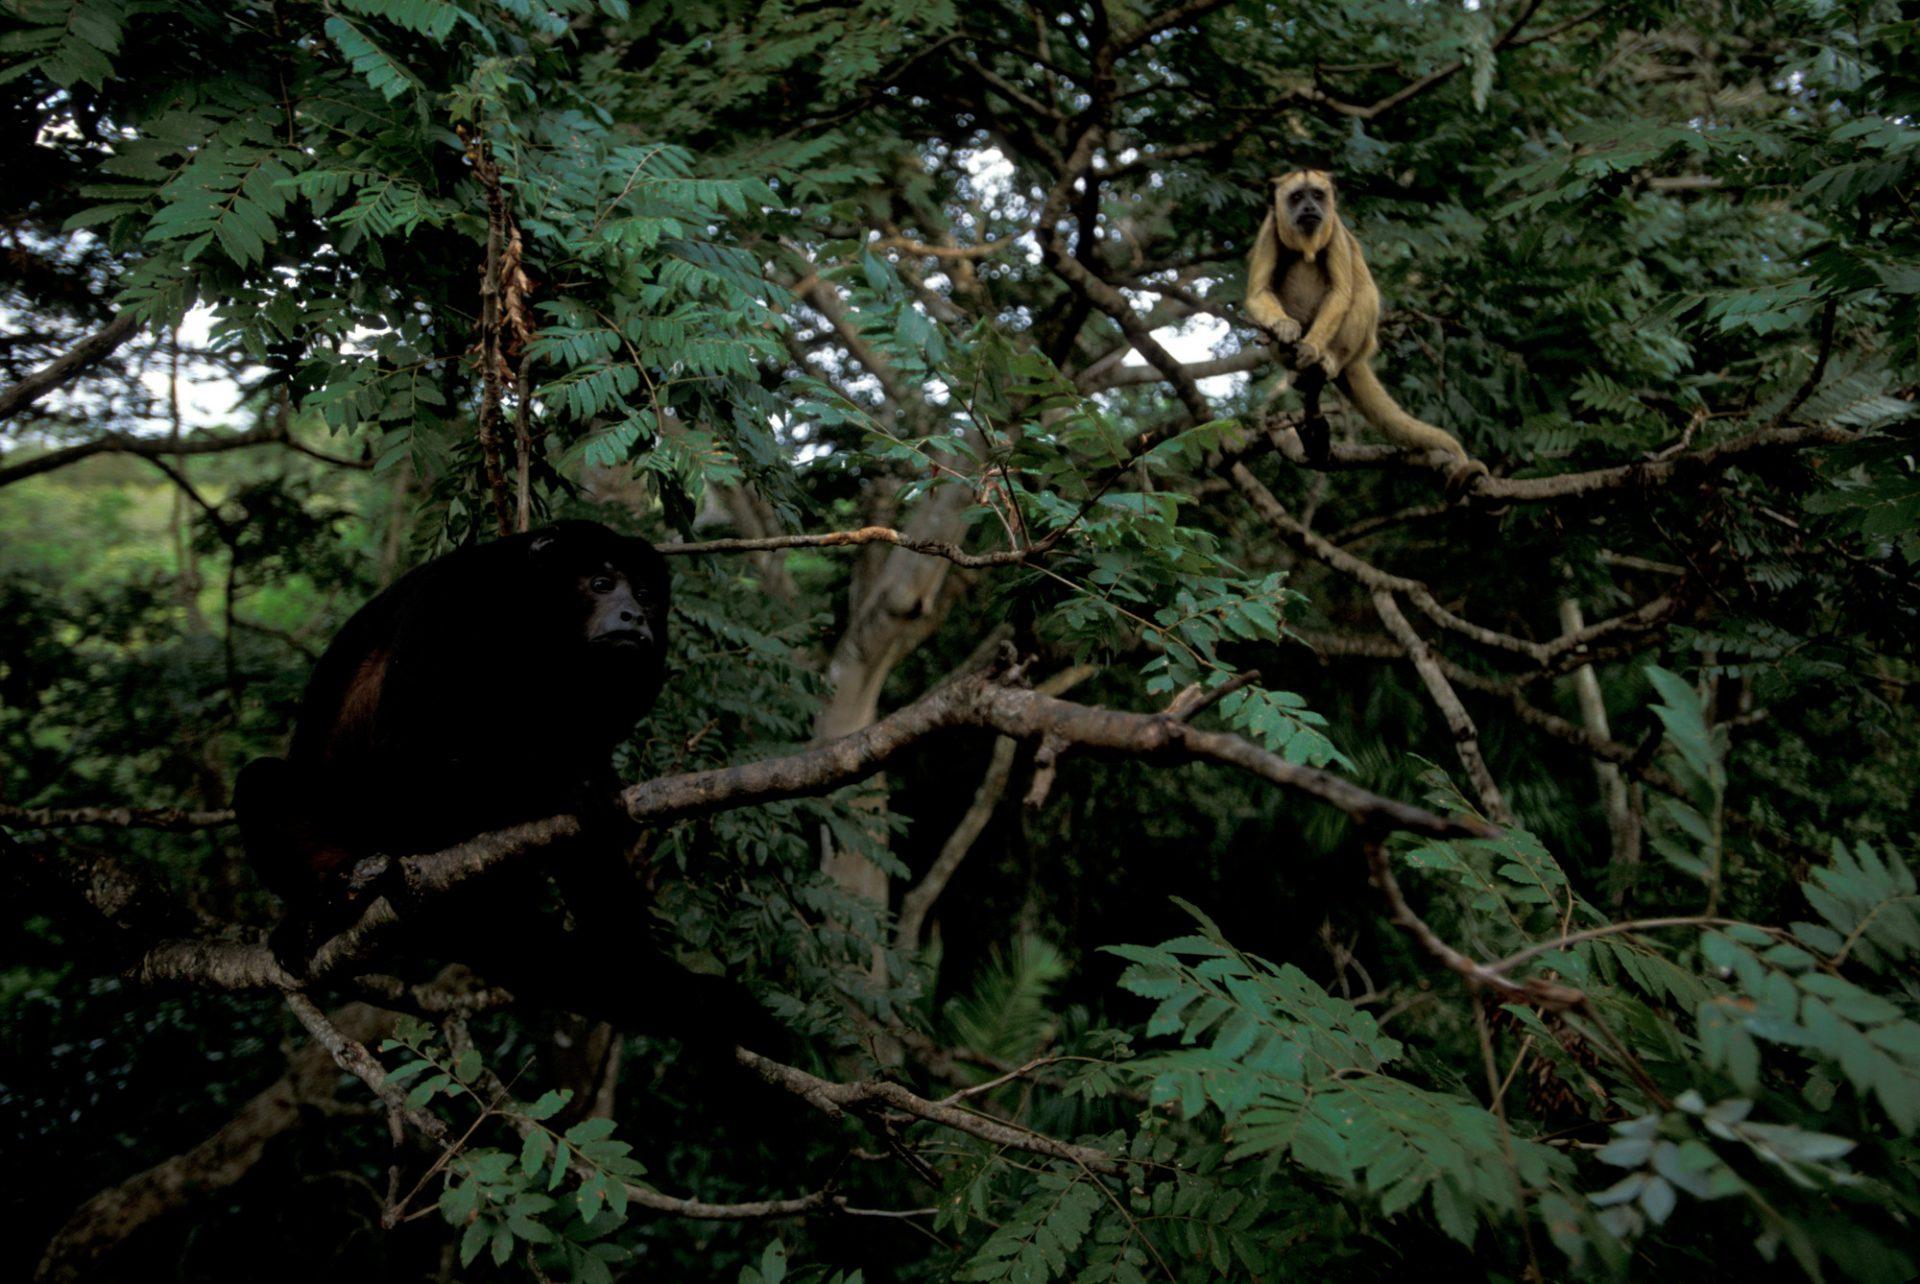 A male (black) and female (brown) black howler monkeys (Alouatta caraya) in the Pantanal, Brazil.